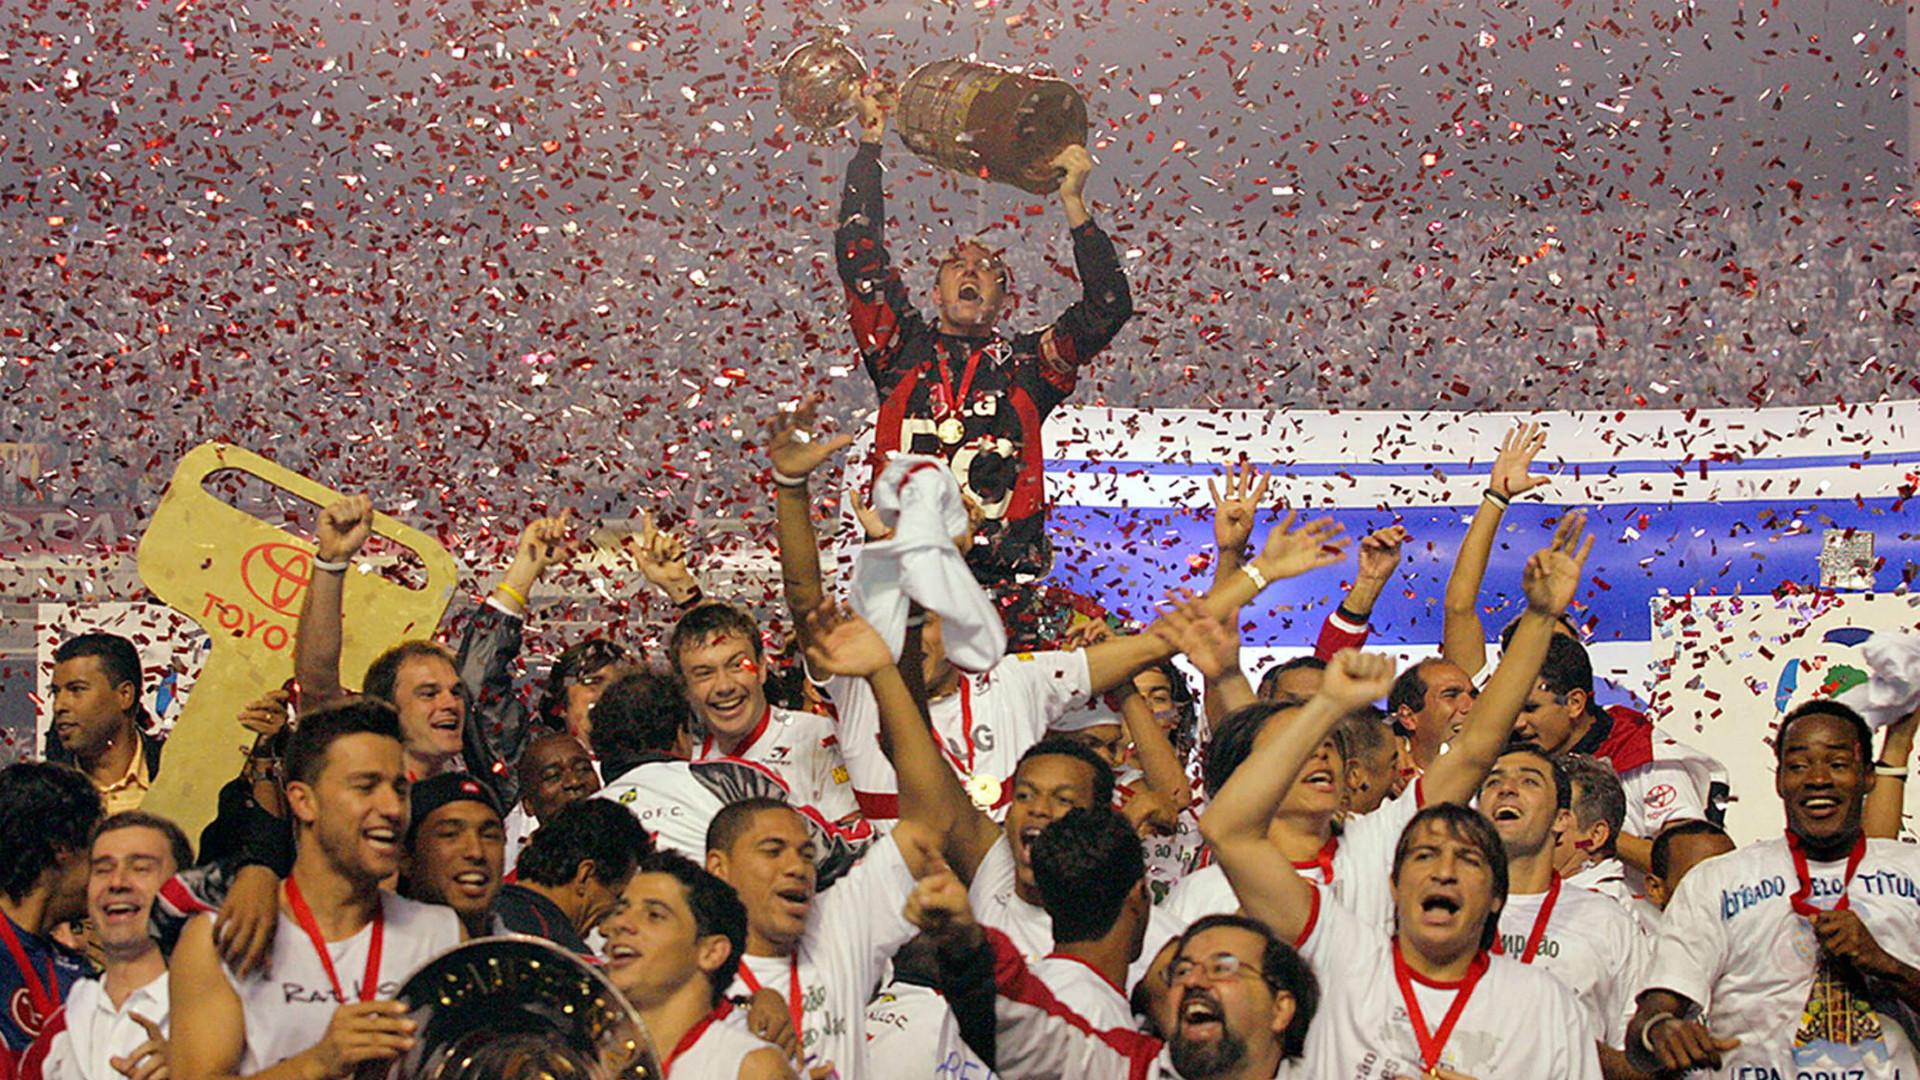 Sao Paulo Copa Libertadores Champions 2005